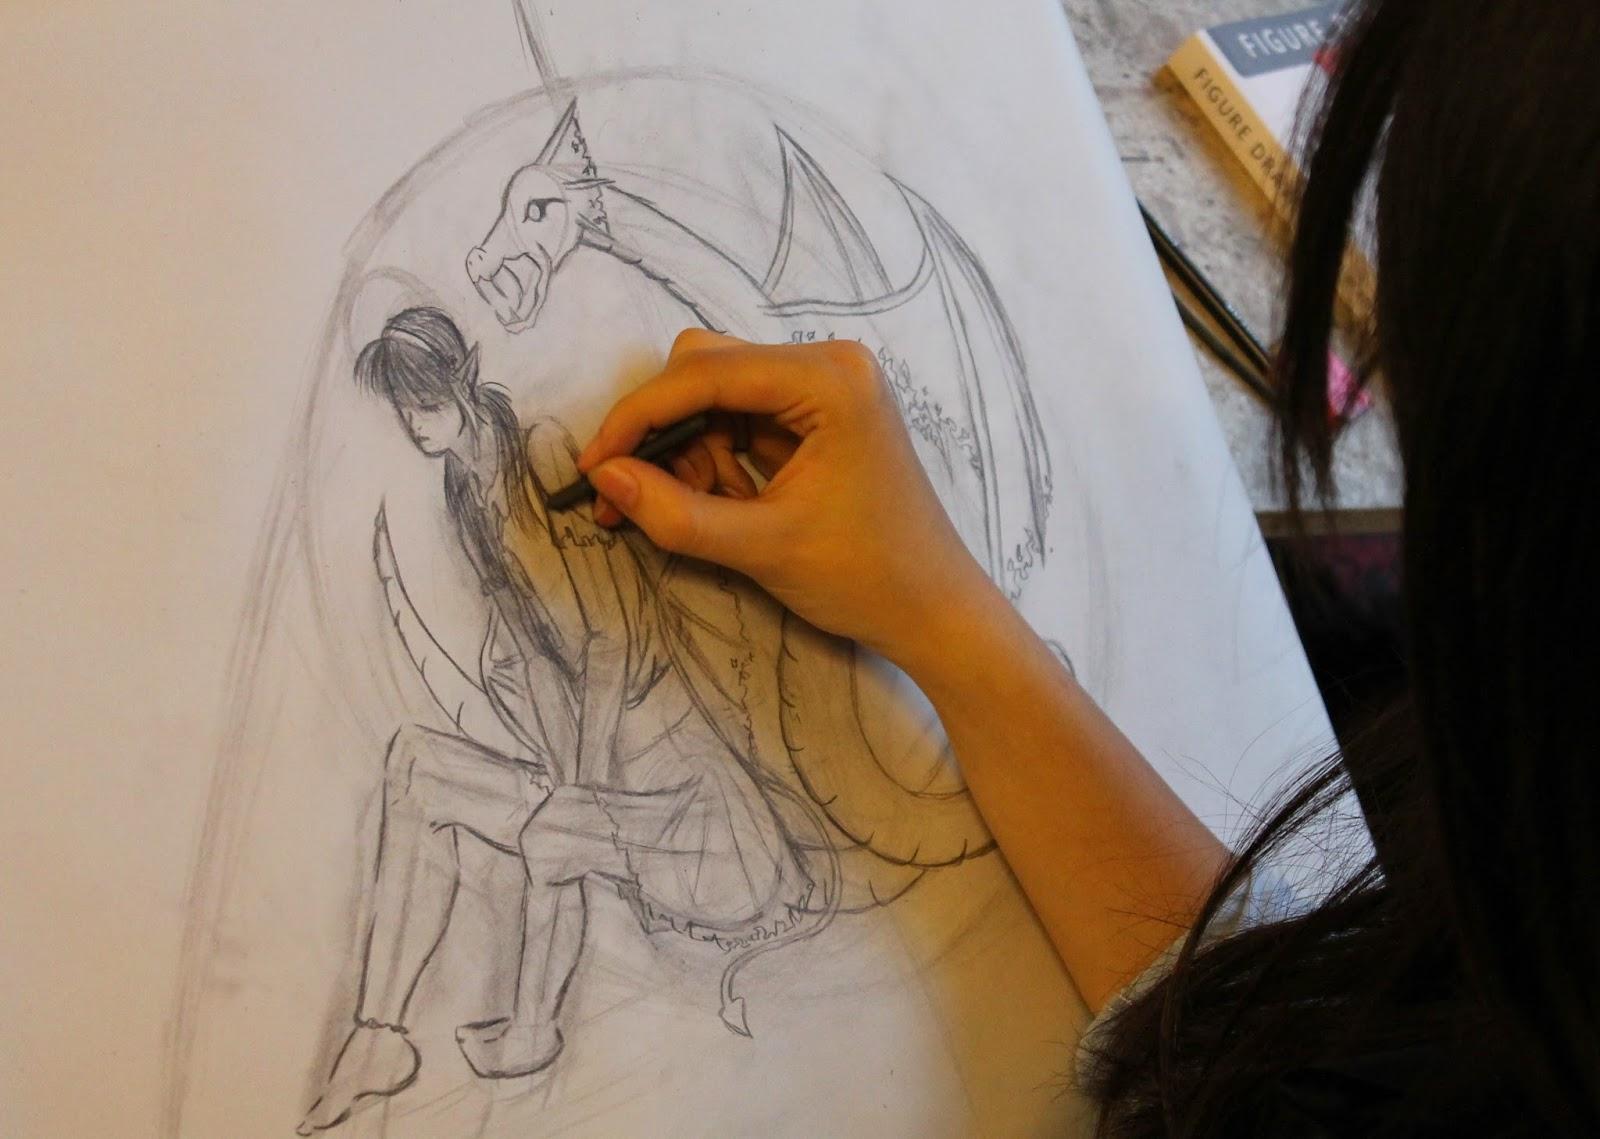 character design, concept art, elf tekenen, fantasy tekenen, figuren tekenen, game art, klassiek tekenen, model studie, model tekenen, NHTV, photoshop, realistisch tekenen, tekenles, tekenlessen,